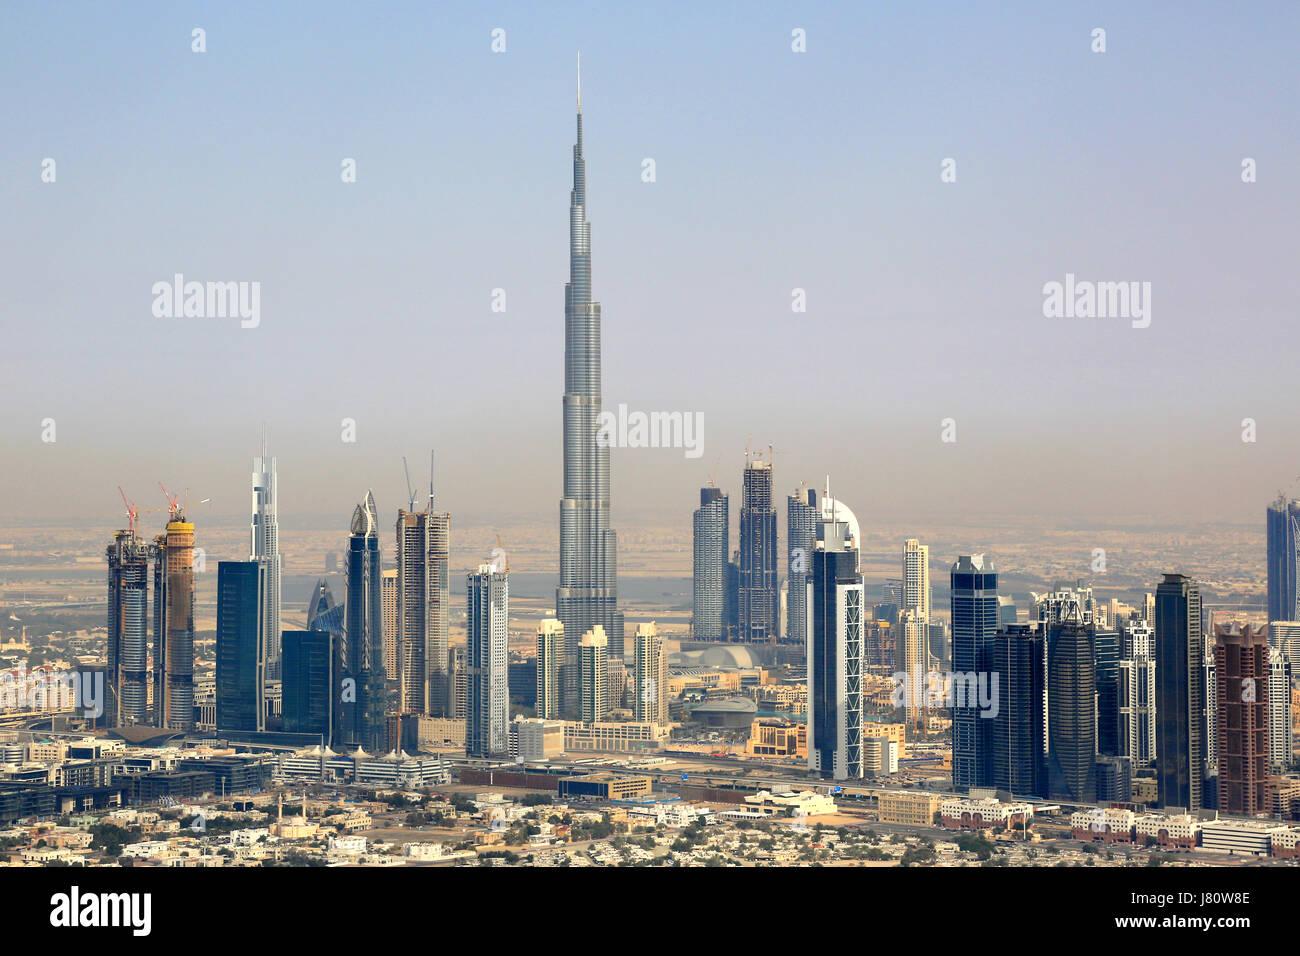 Dubai Burj Khalifa Innenstadt Luftaufnahme Fotografie Vereinigte Arabische Emirate Stockbild